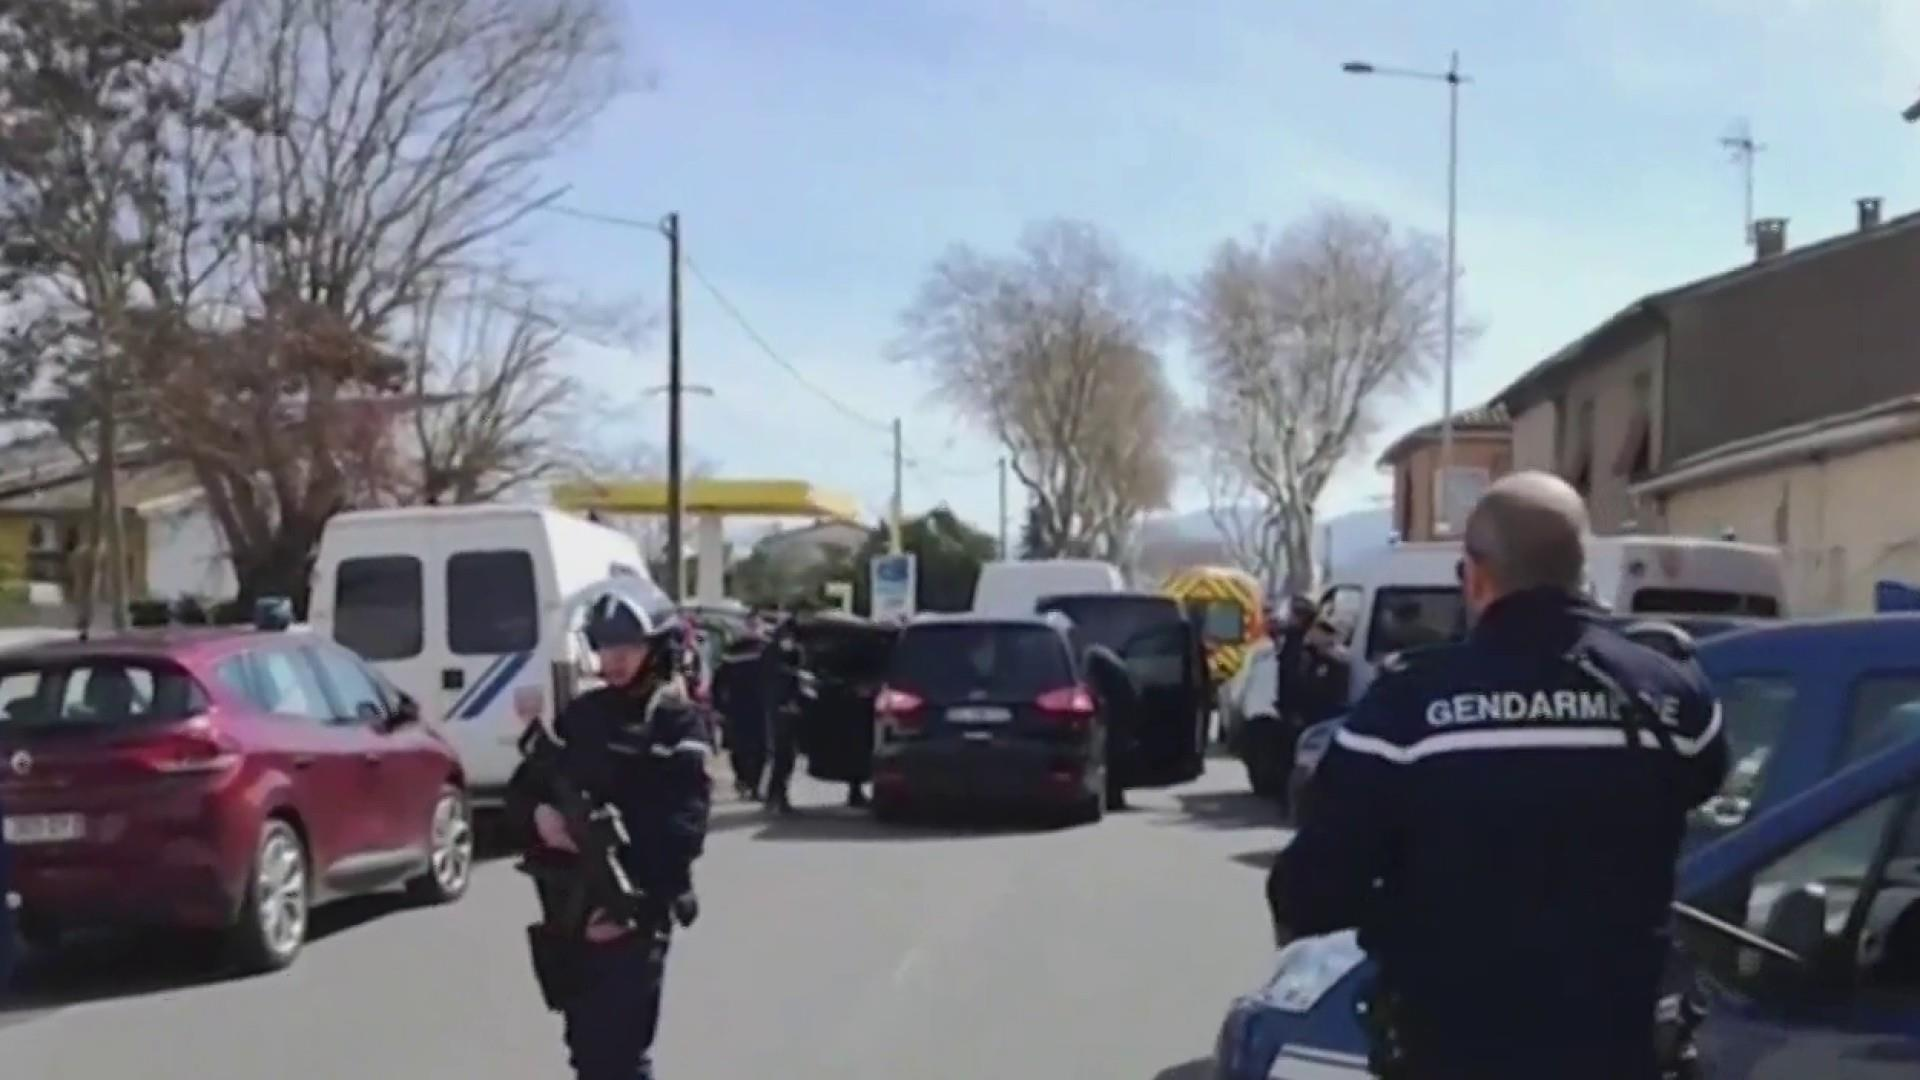 Gunman killed after hostage terrorist attack in France